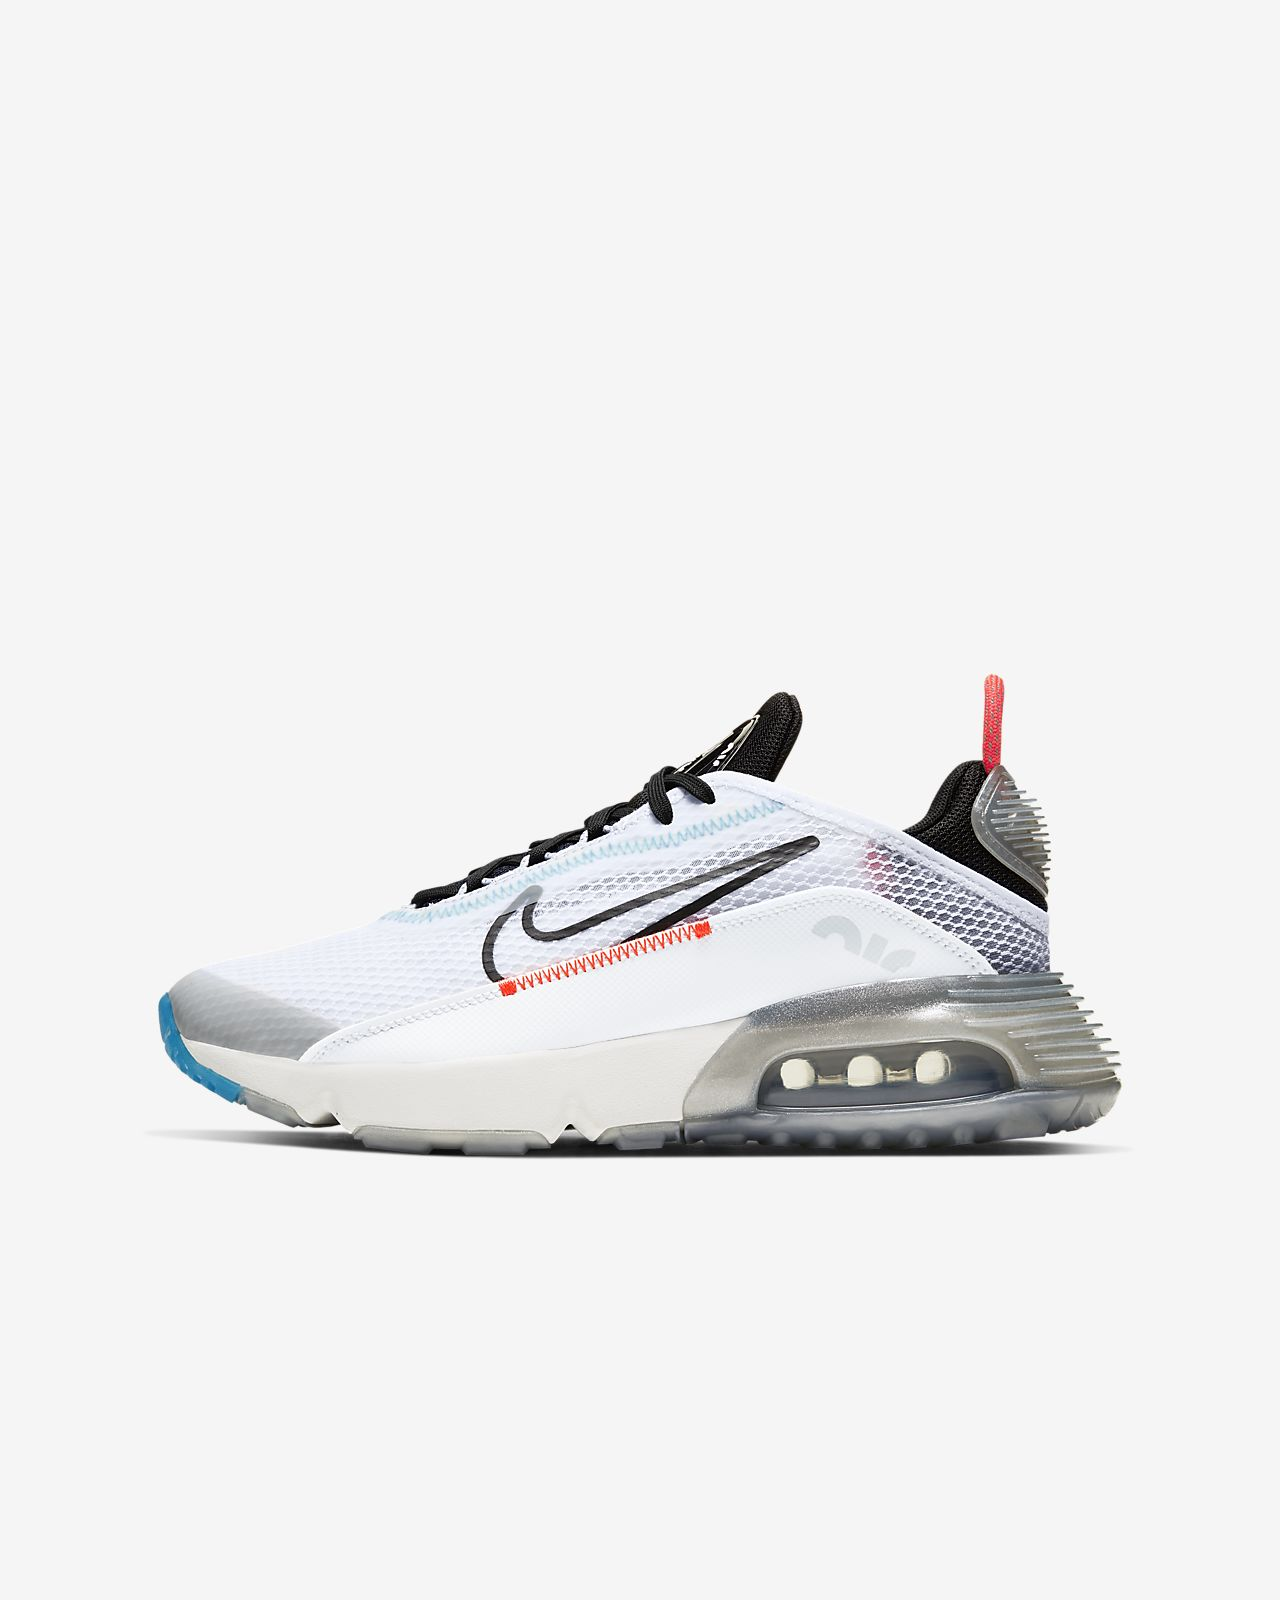 Buty dla dużych dzieci Nike Air Max 2090